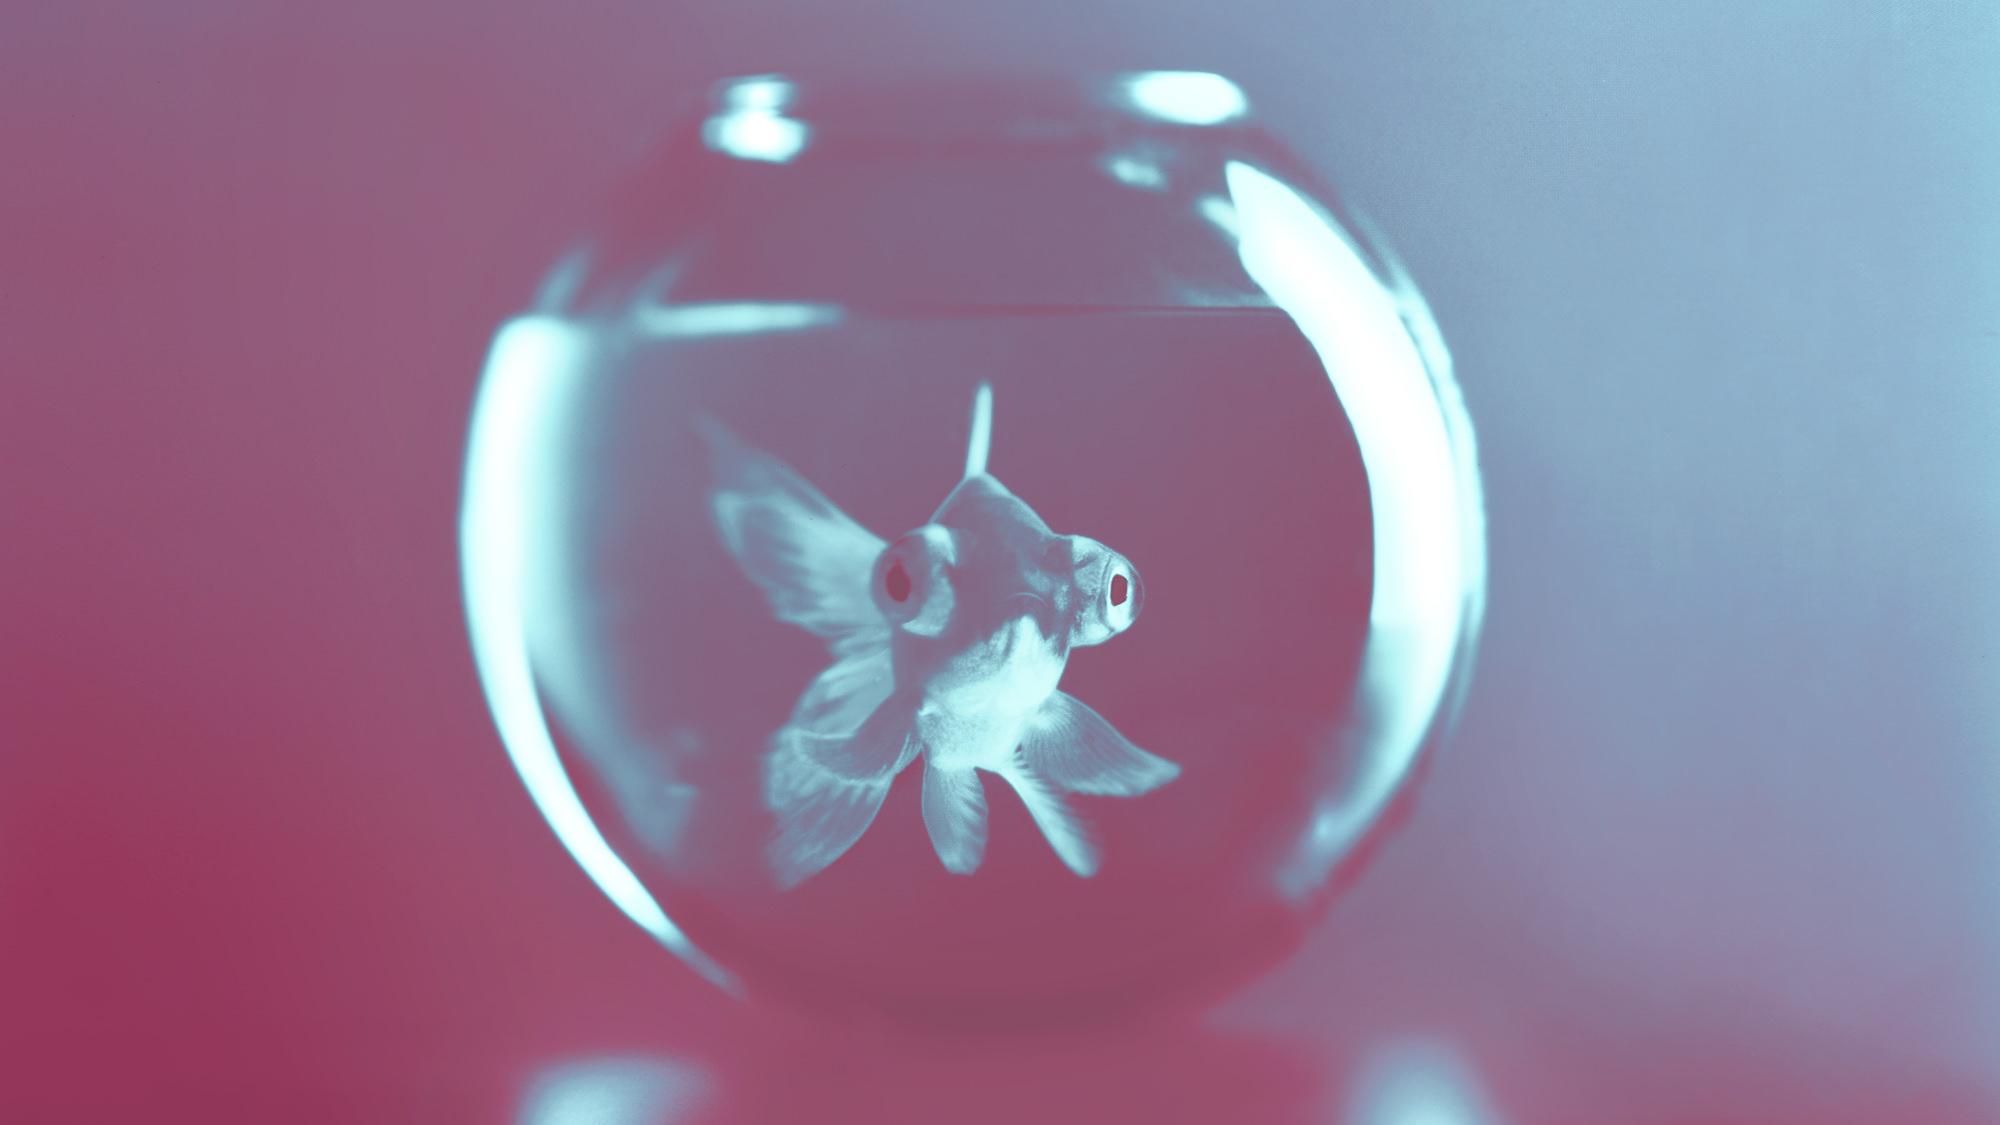 BIG-FISH-LITTLE-BOWL-STEPHEN-STEWART.jpg